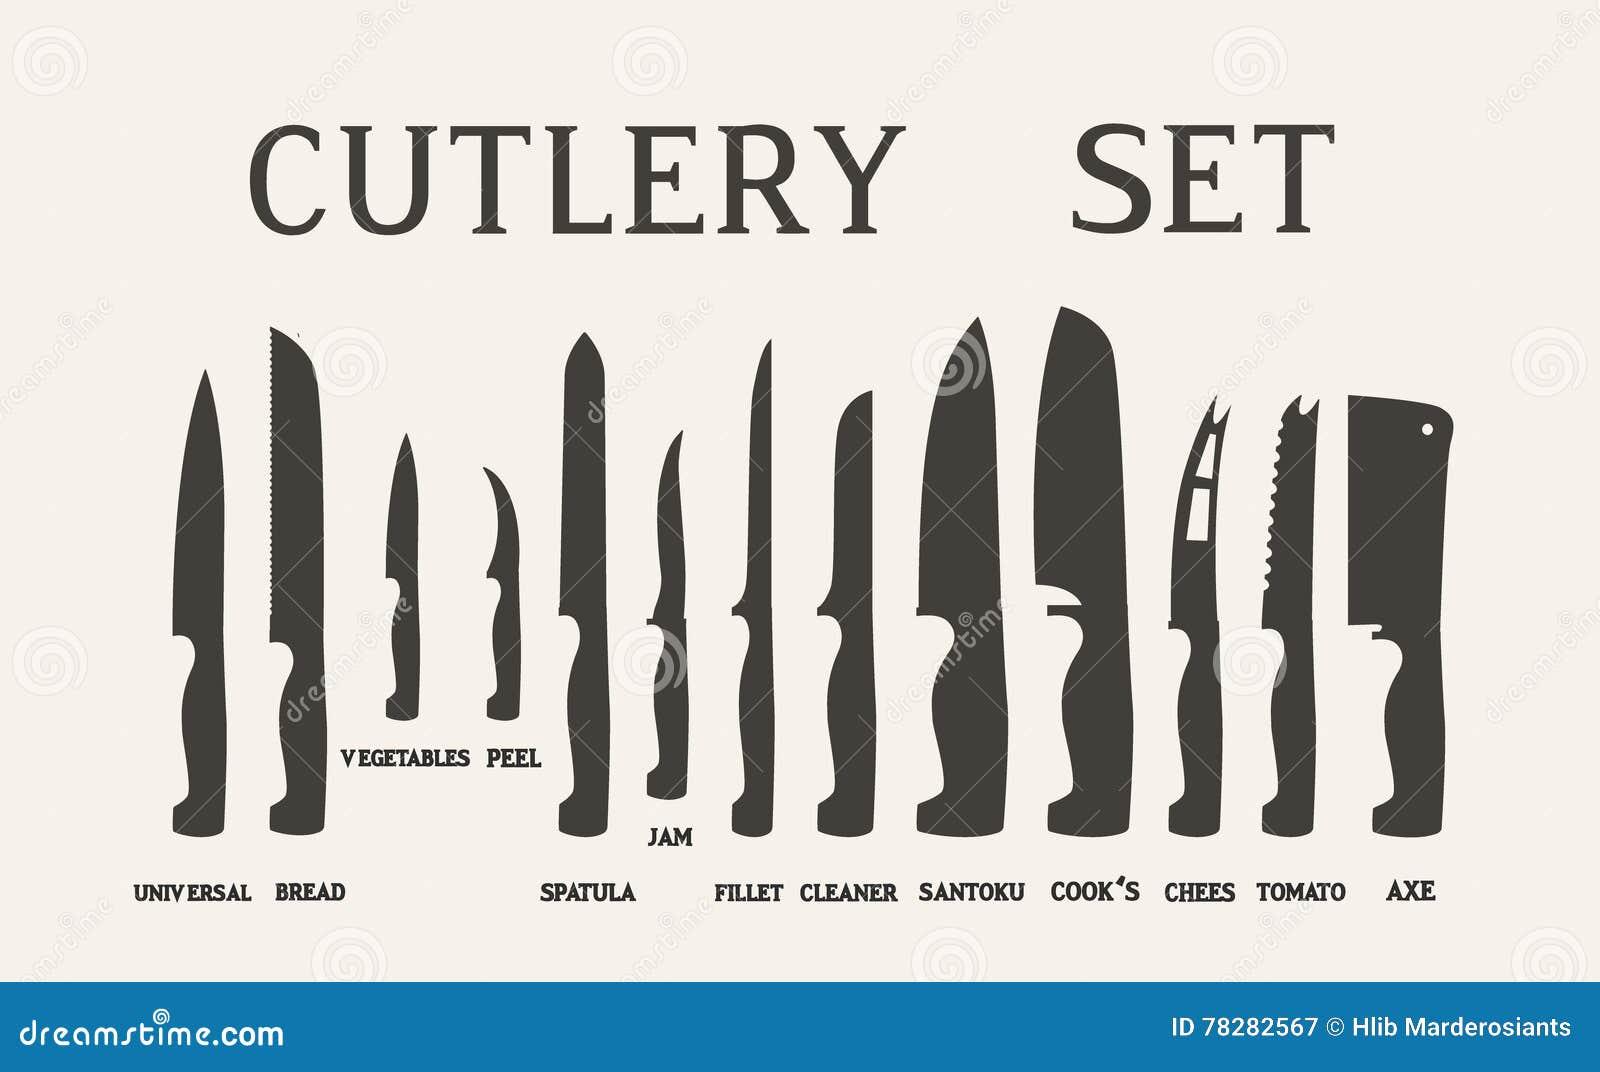 Kitchen Knives Set Names